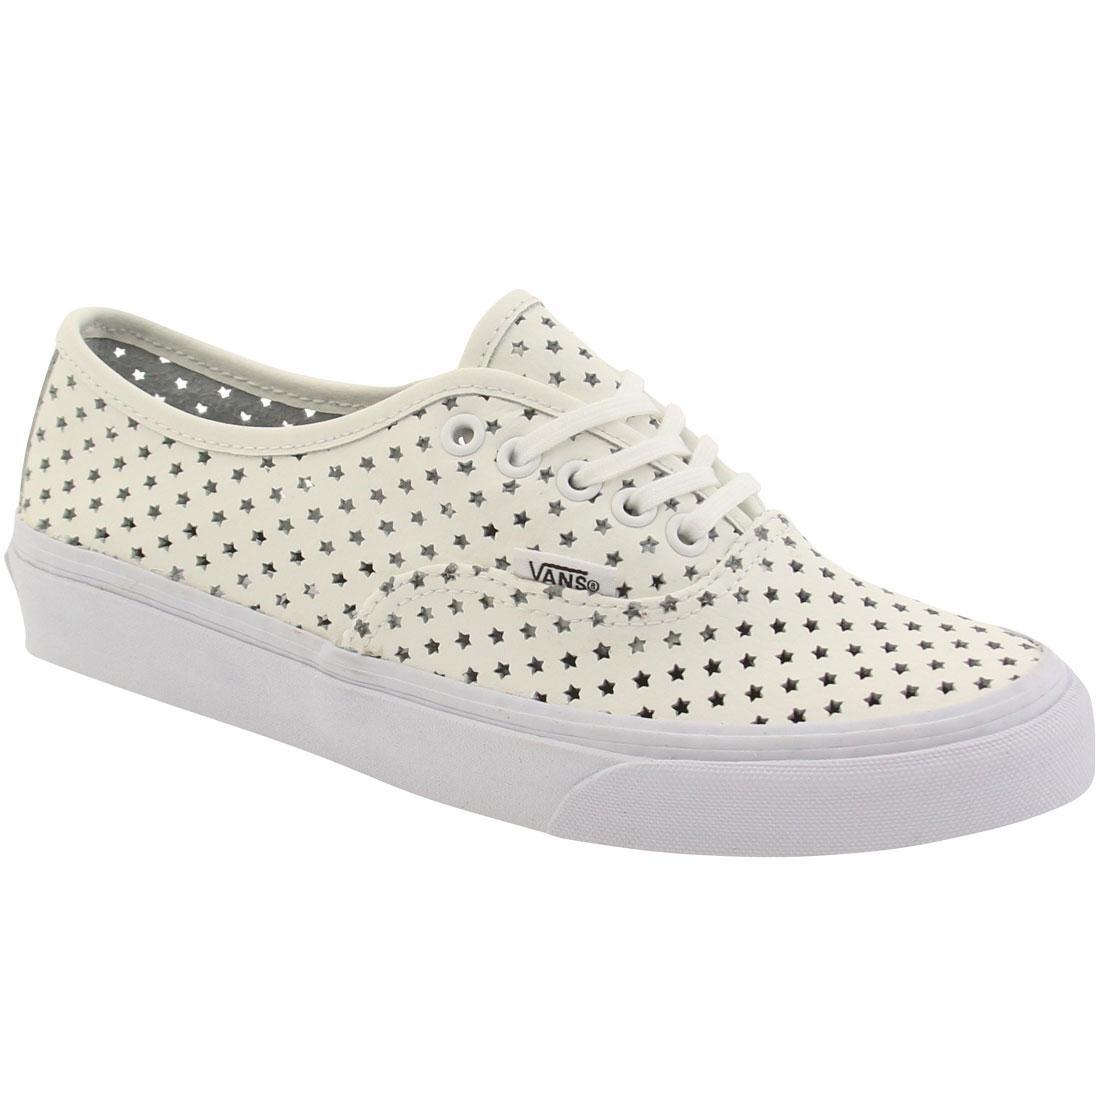 8b9c47b50fff08 Vans Women Authentic Slim - Perf Stars (white   true white)